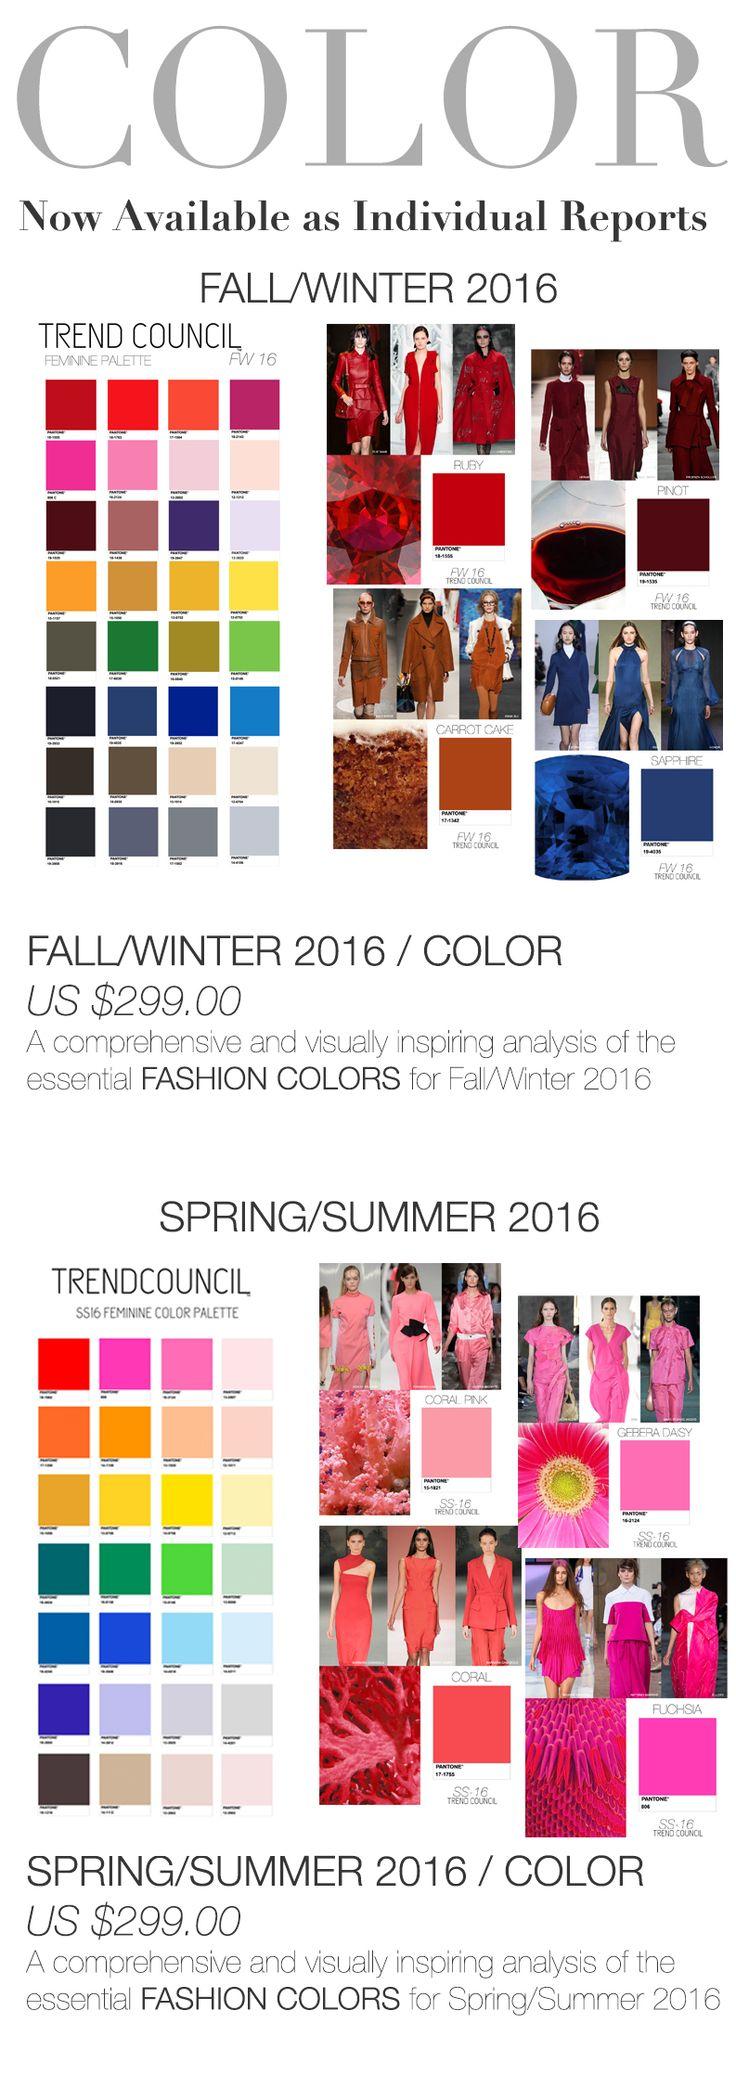 91 best spring summer 2016 color images on pinterest colors sew